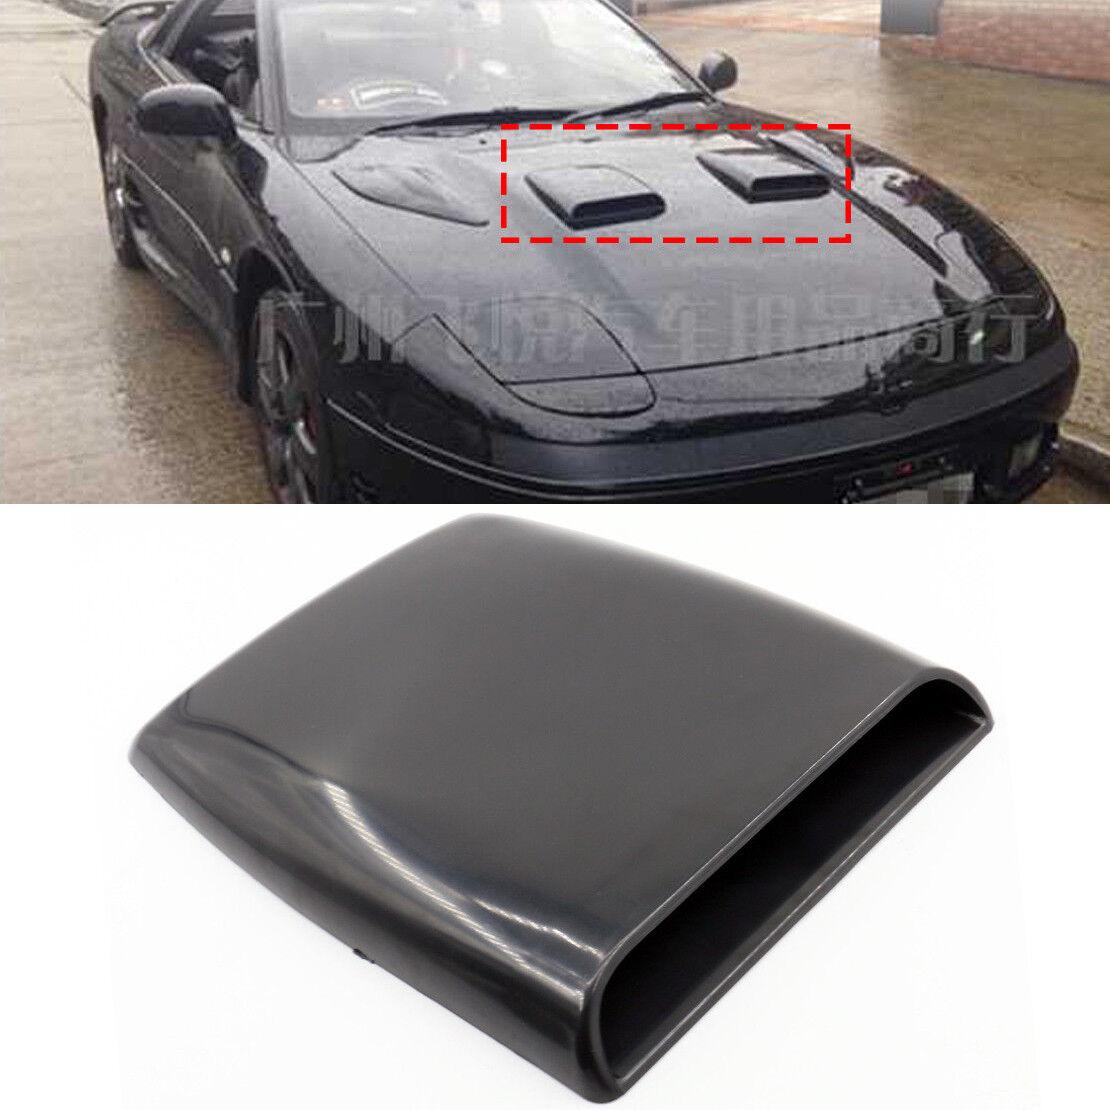 黑色 Car Air Flow Vent Hood,Auto Decorative Air Scoop Flow Intake Hood Vent Bonnet Universal DIY Style Black 2X